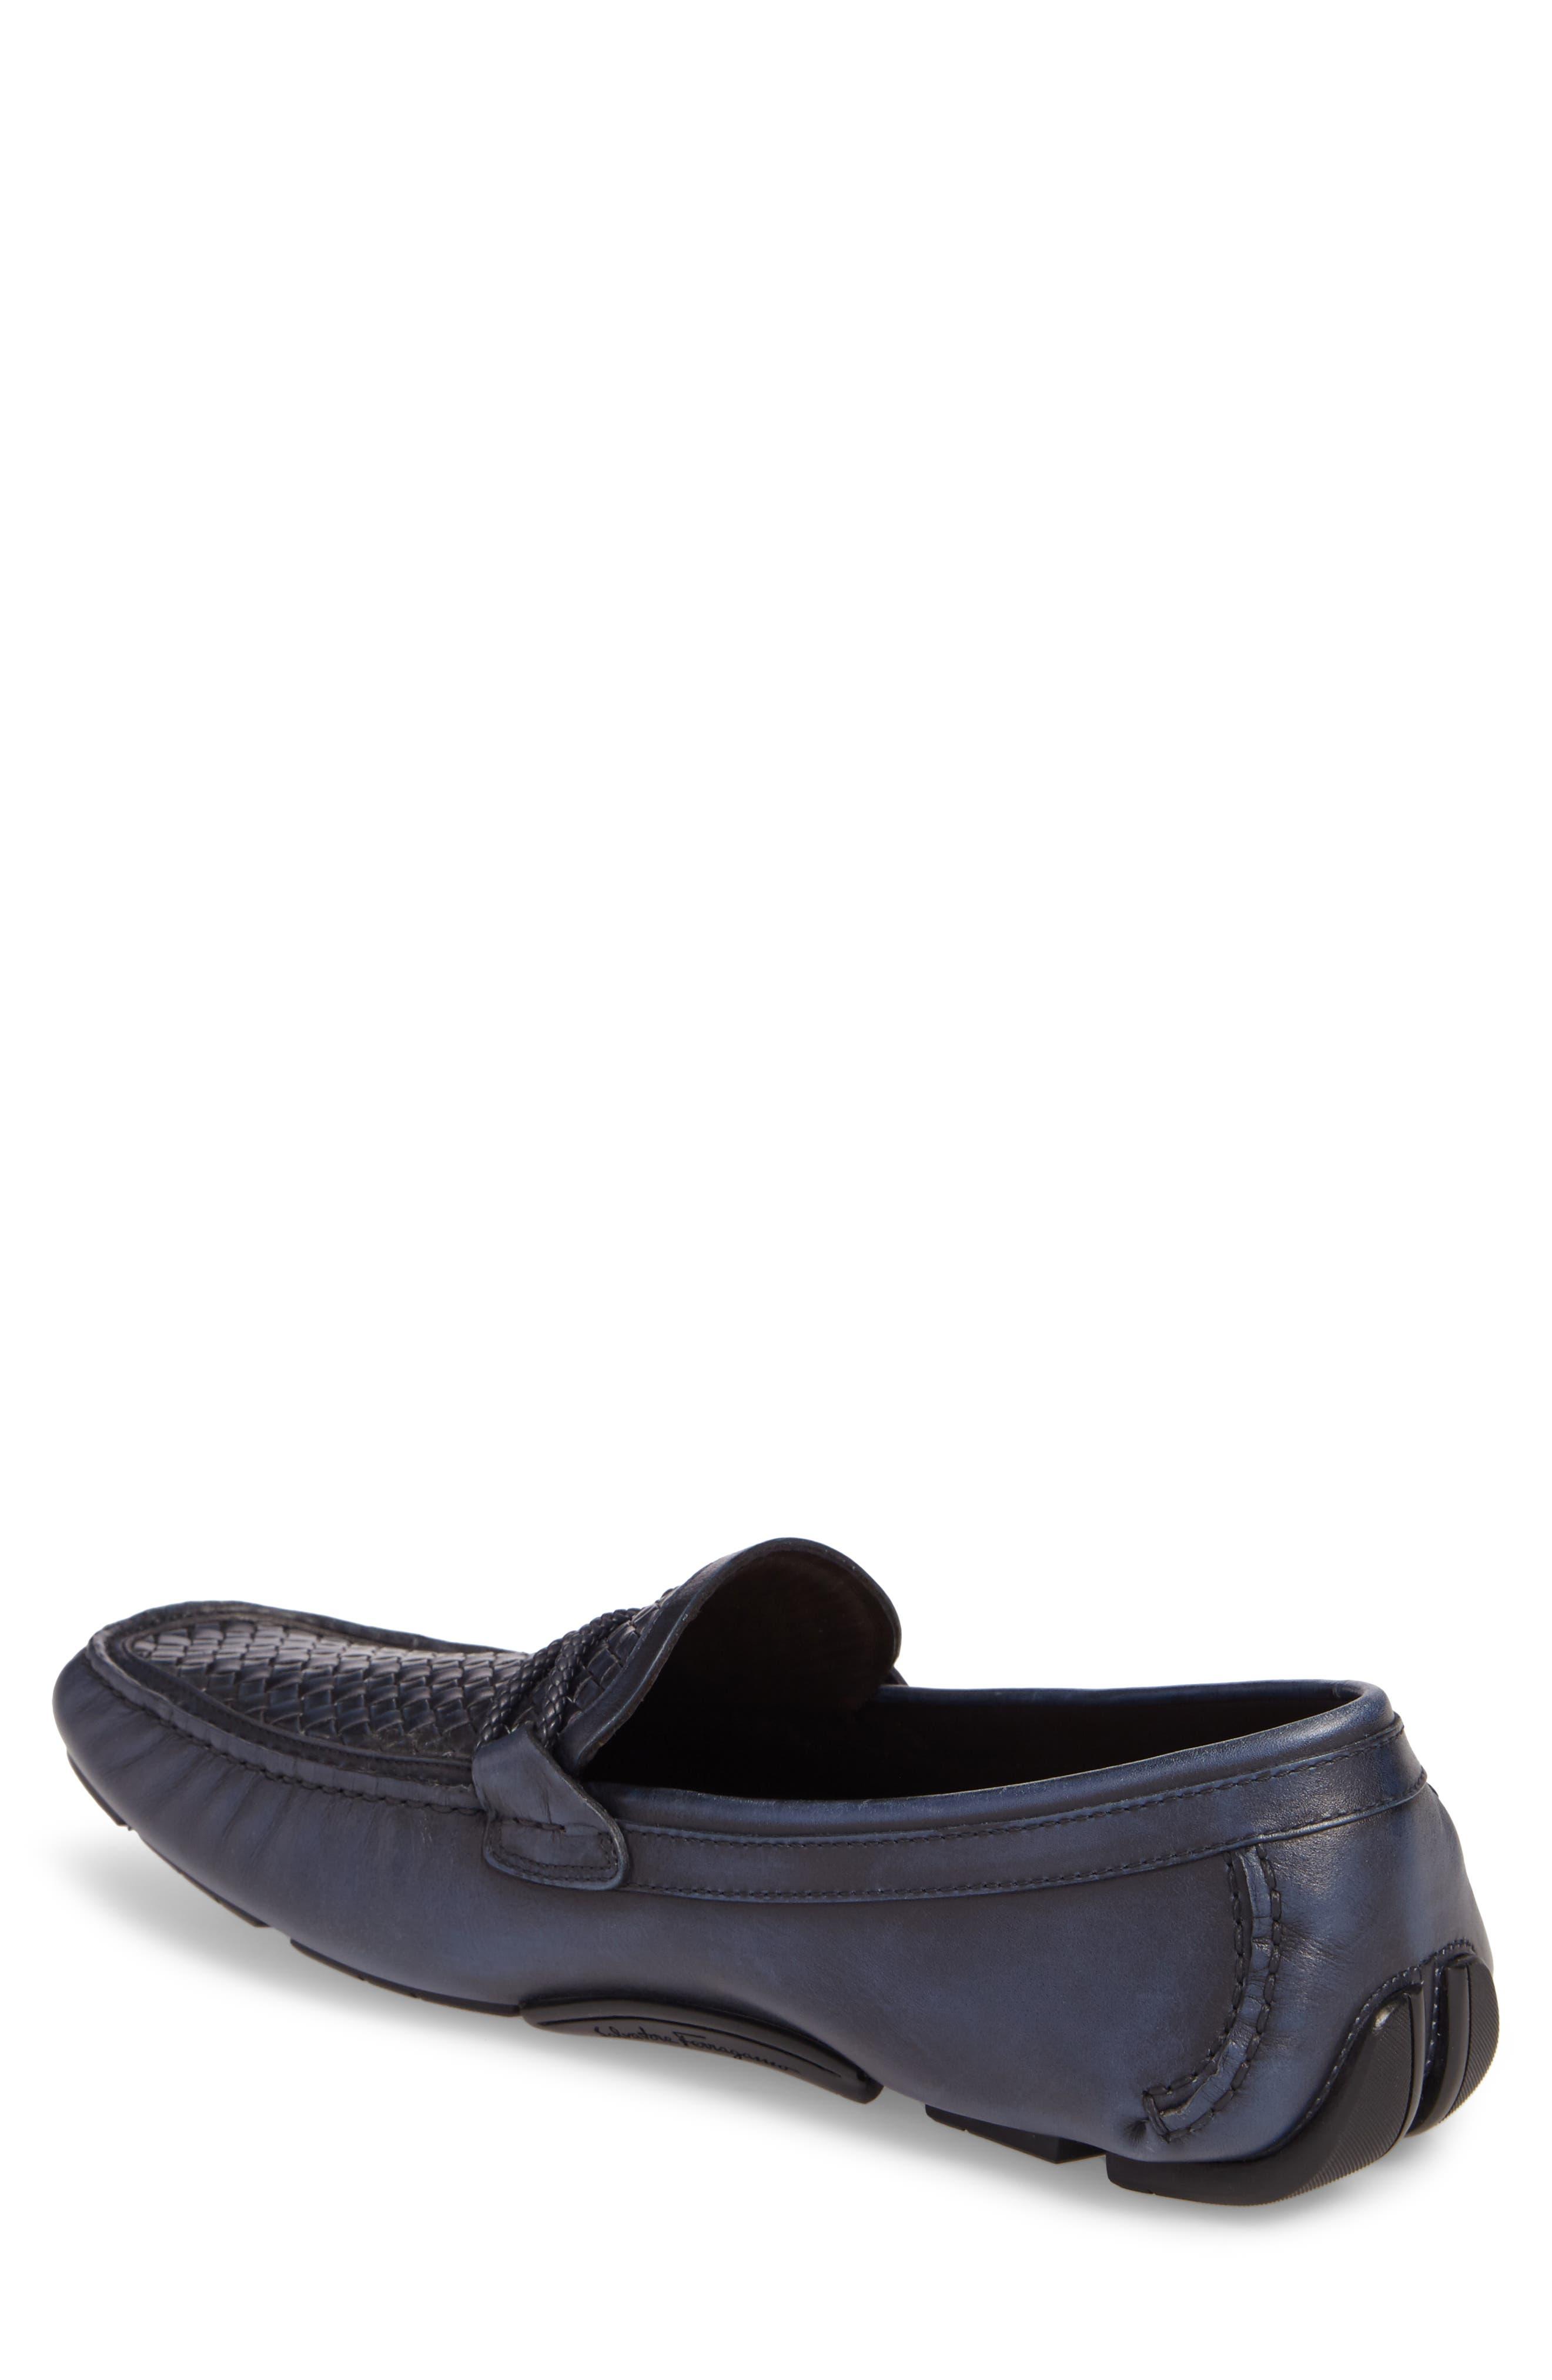 Front Driving Shoe,                             Alternate thumbnail 2, color,                             Sunset Blue/ Navy